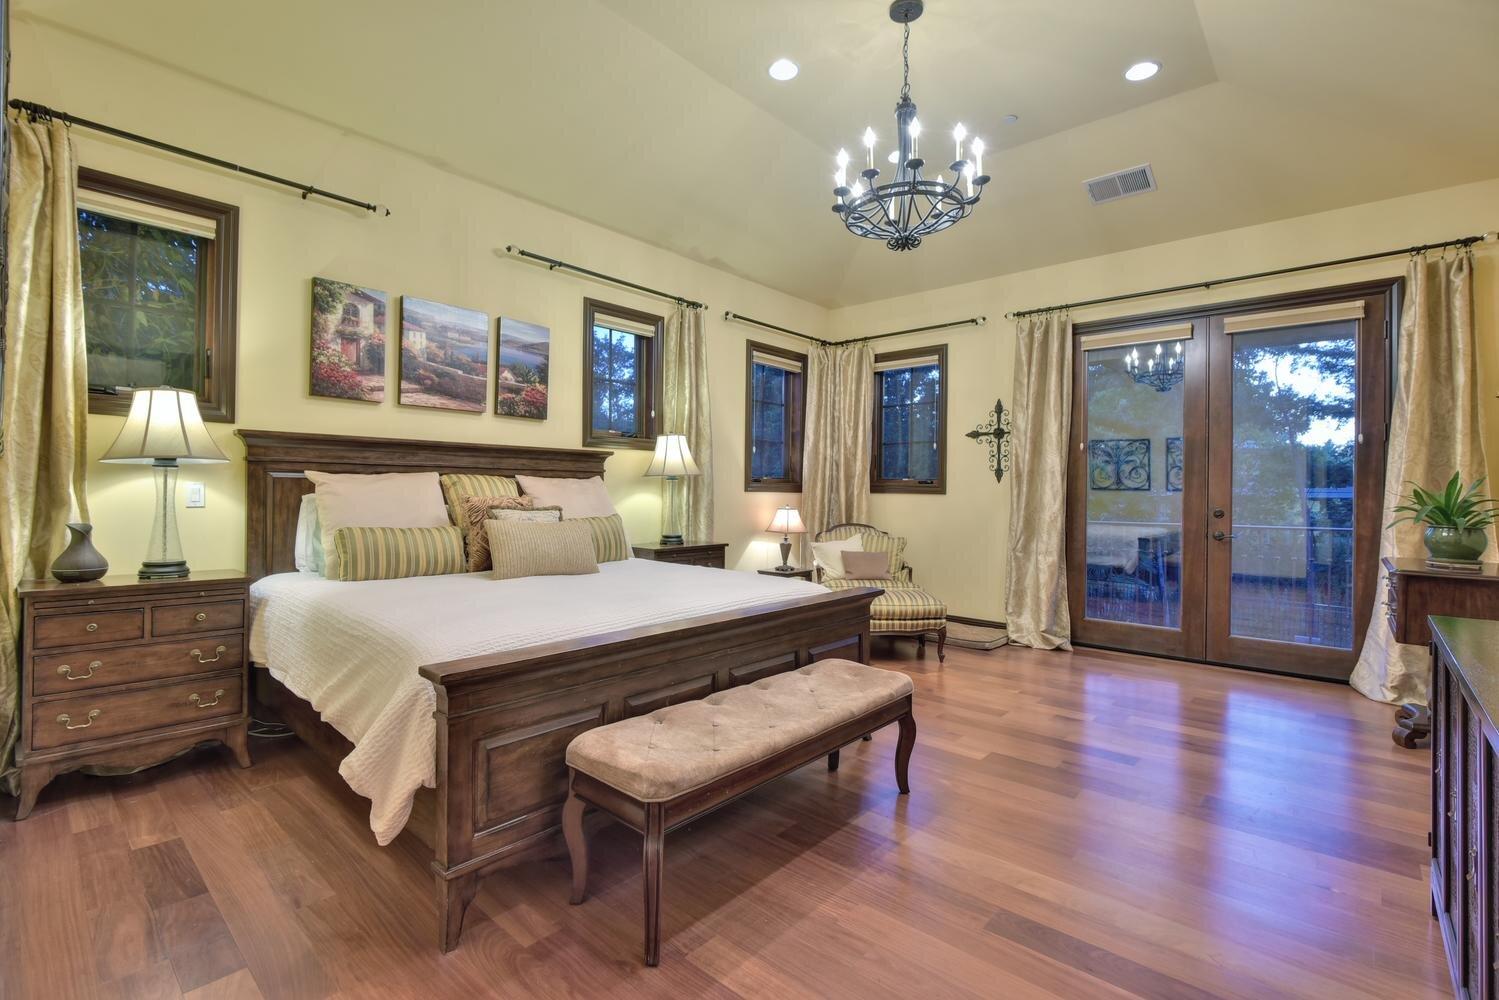 16021 Winterbrook Rd Los Gatos-large-034-024-Master Bedroom-1500x1000-72dpi.jpg